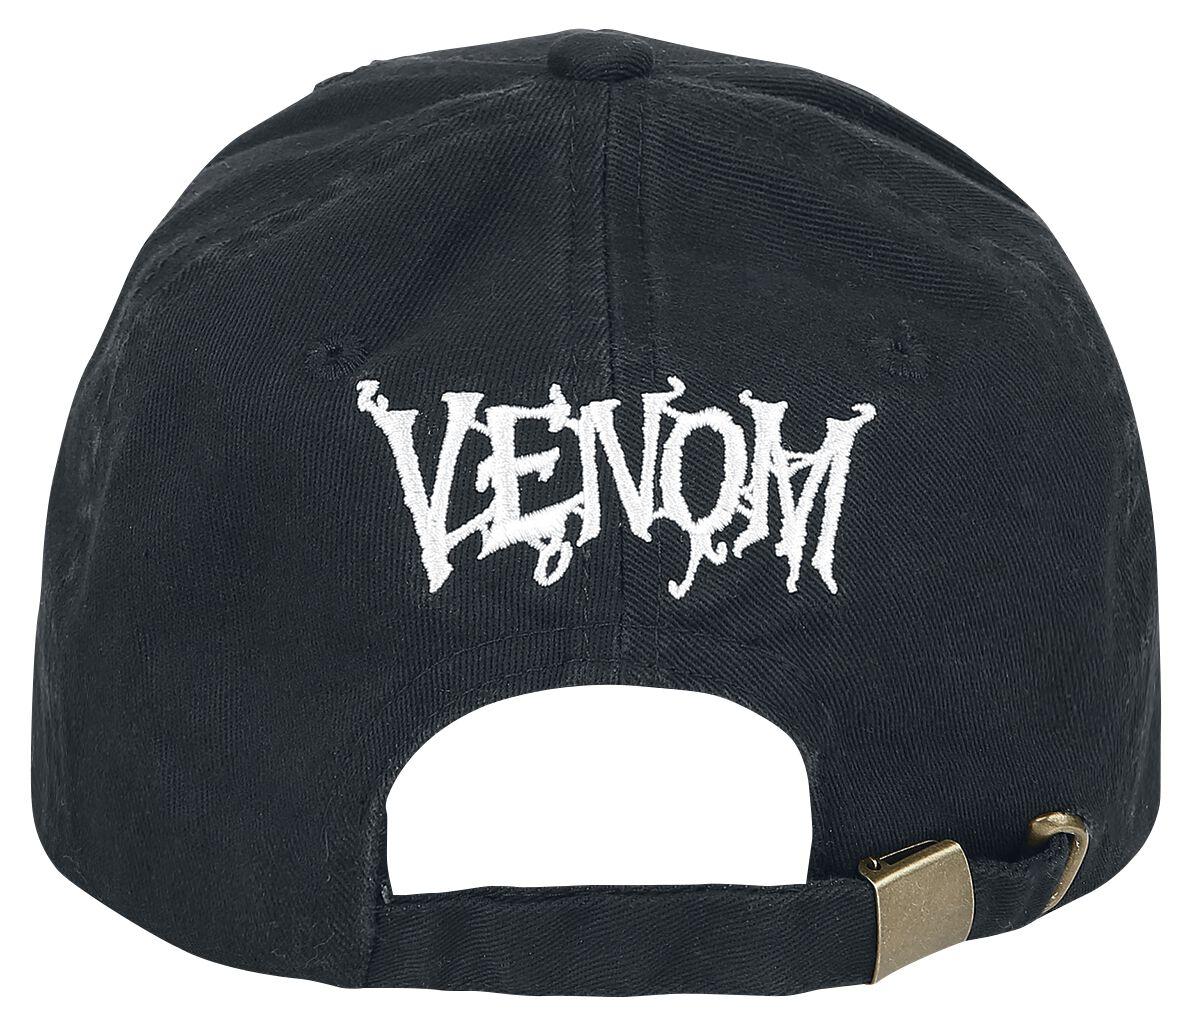 66c44e70192 More from Venom (Marvel)